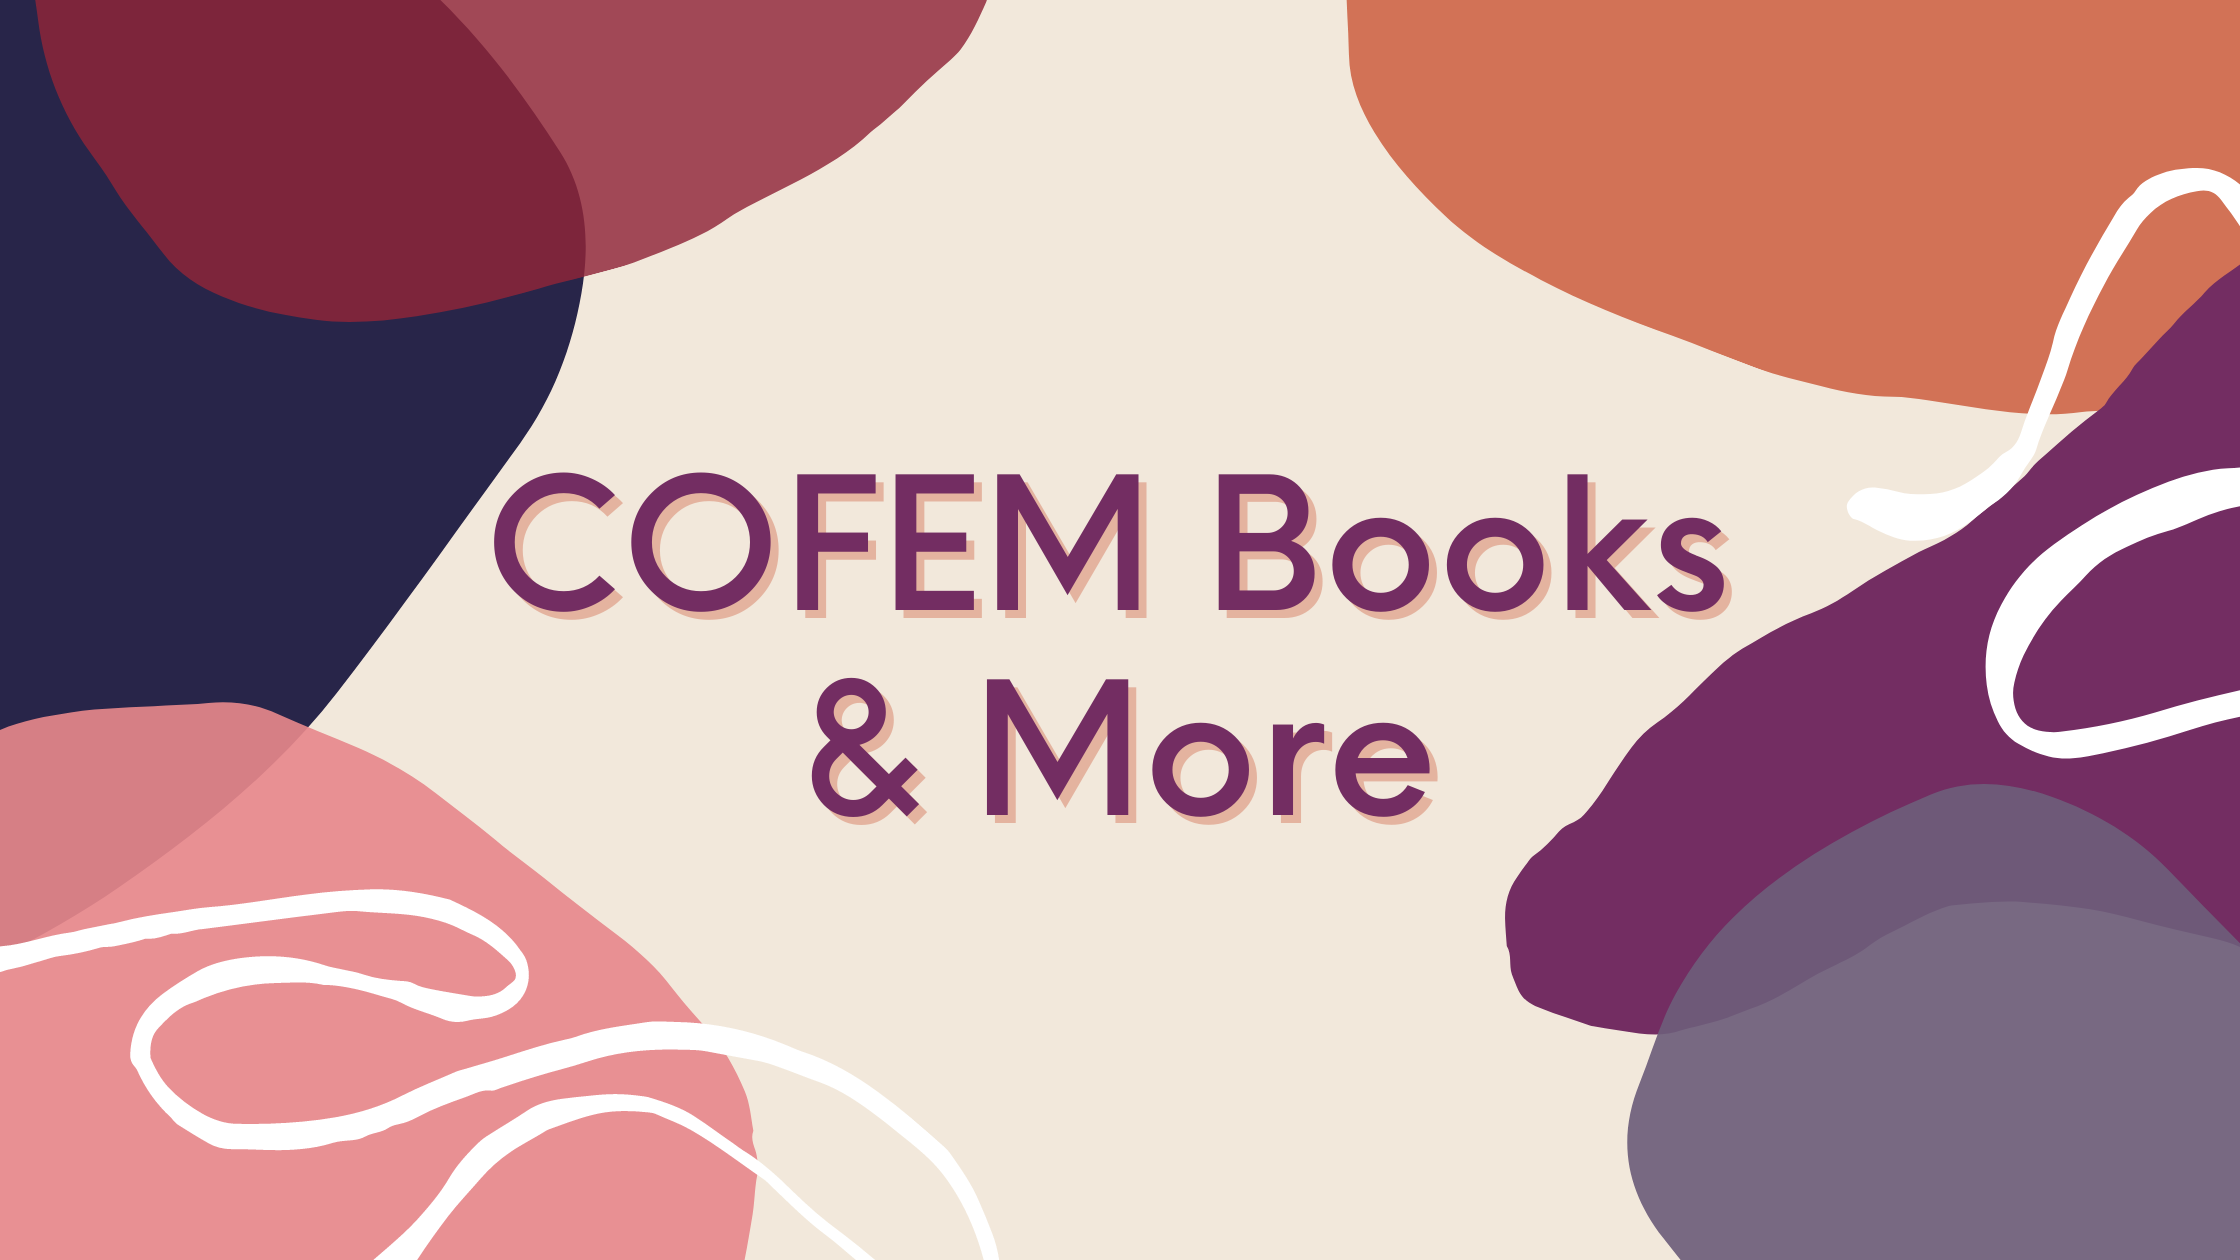 Cofem books and more